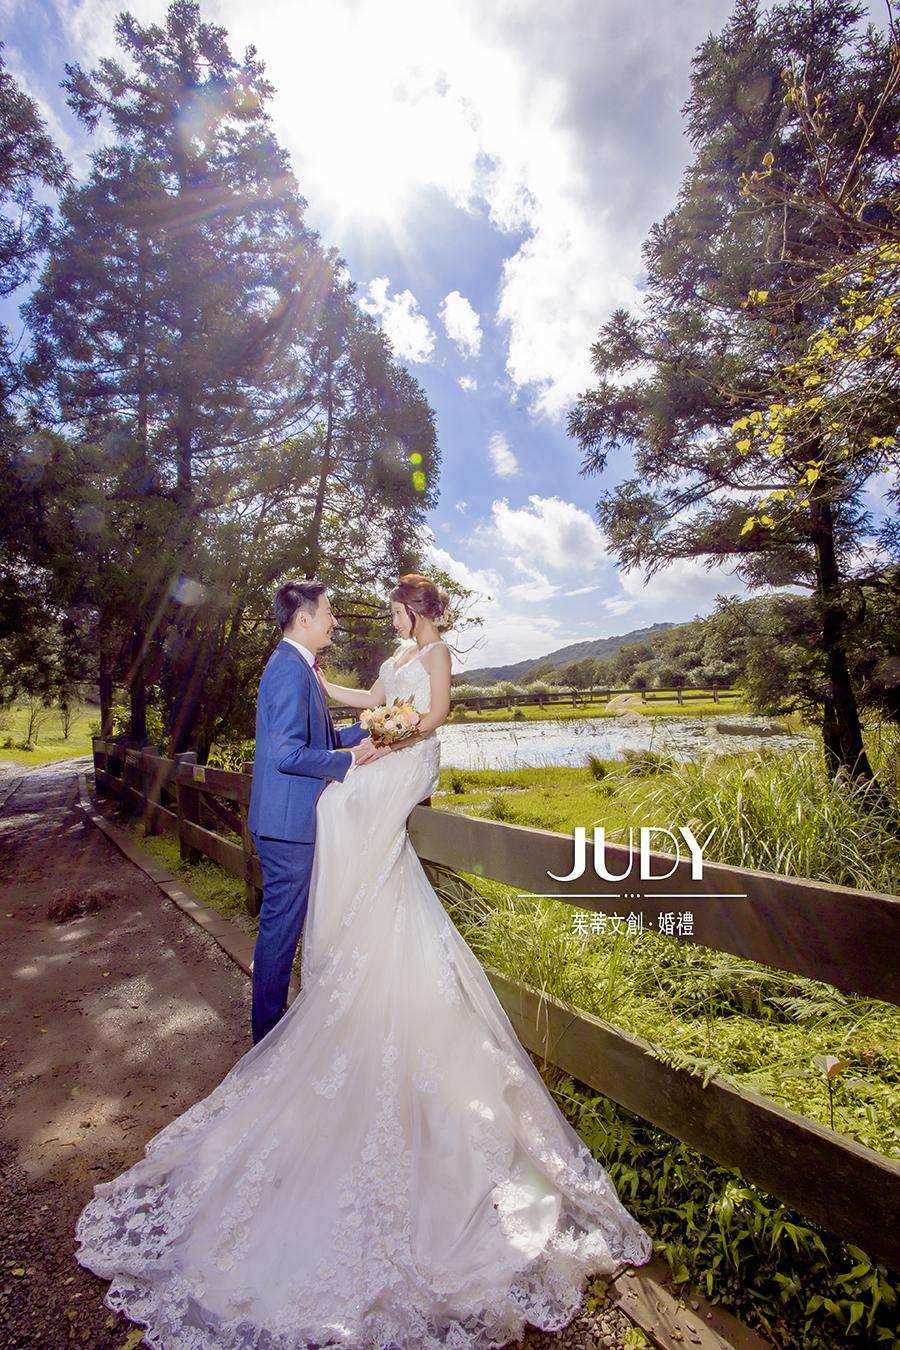 httpswwhttps://www.judywedding.com/w - 【Judy婚紗】茱蒂文創 · 婚禮《結婚吧》